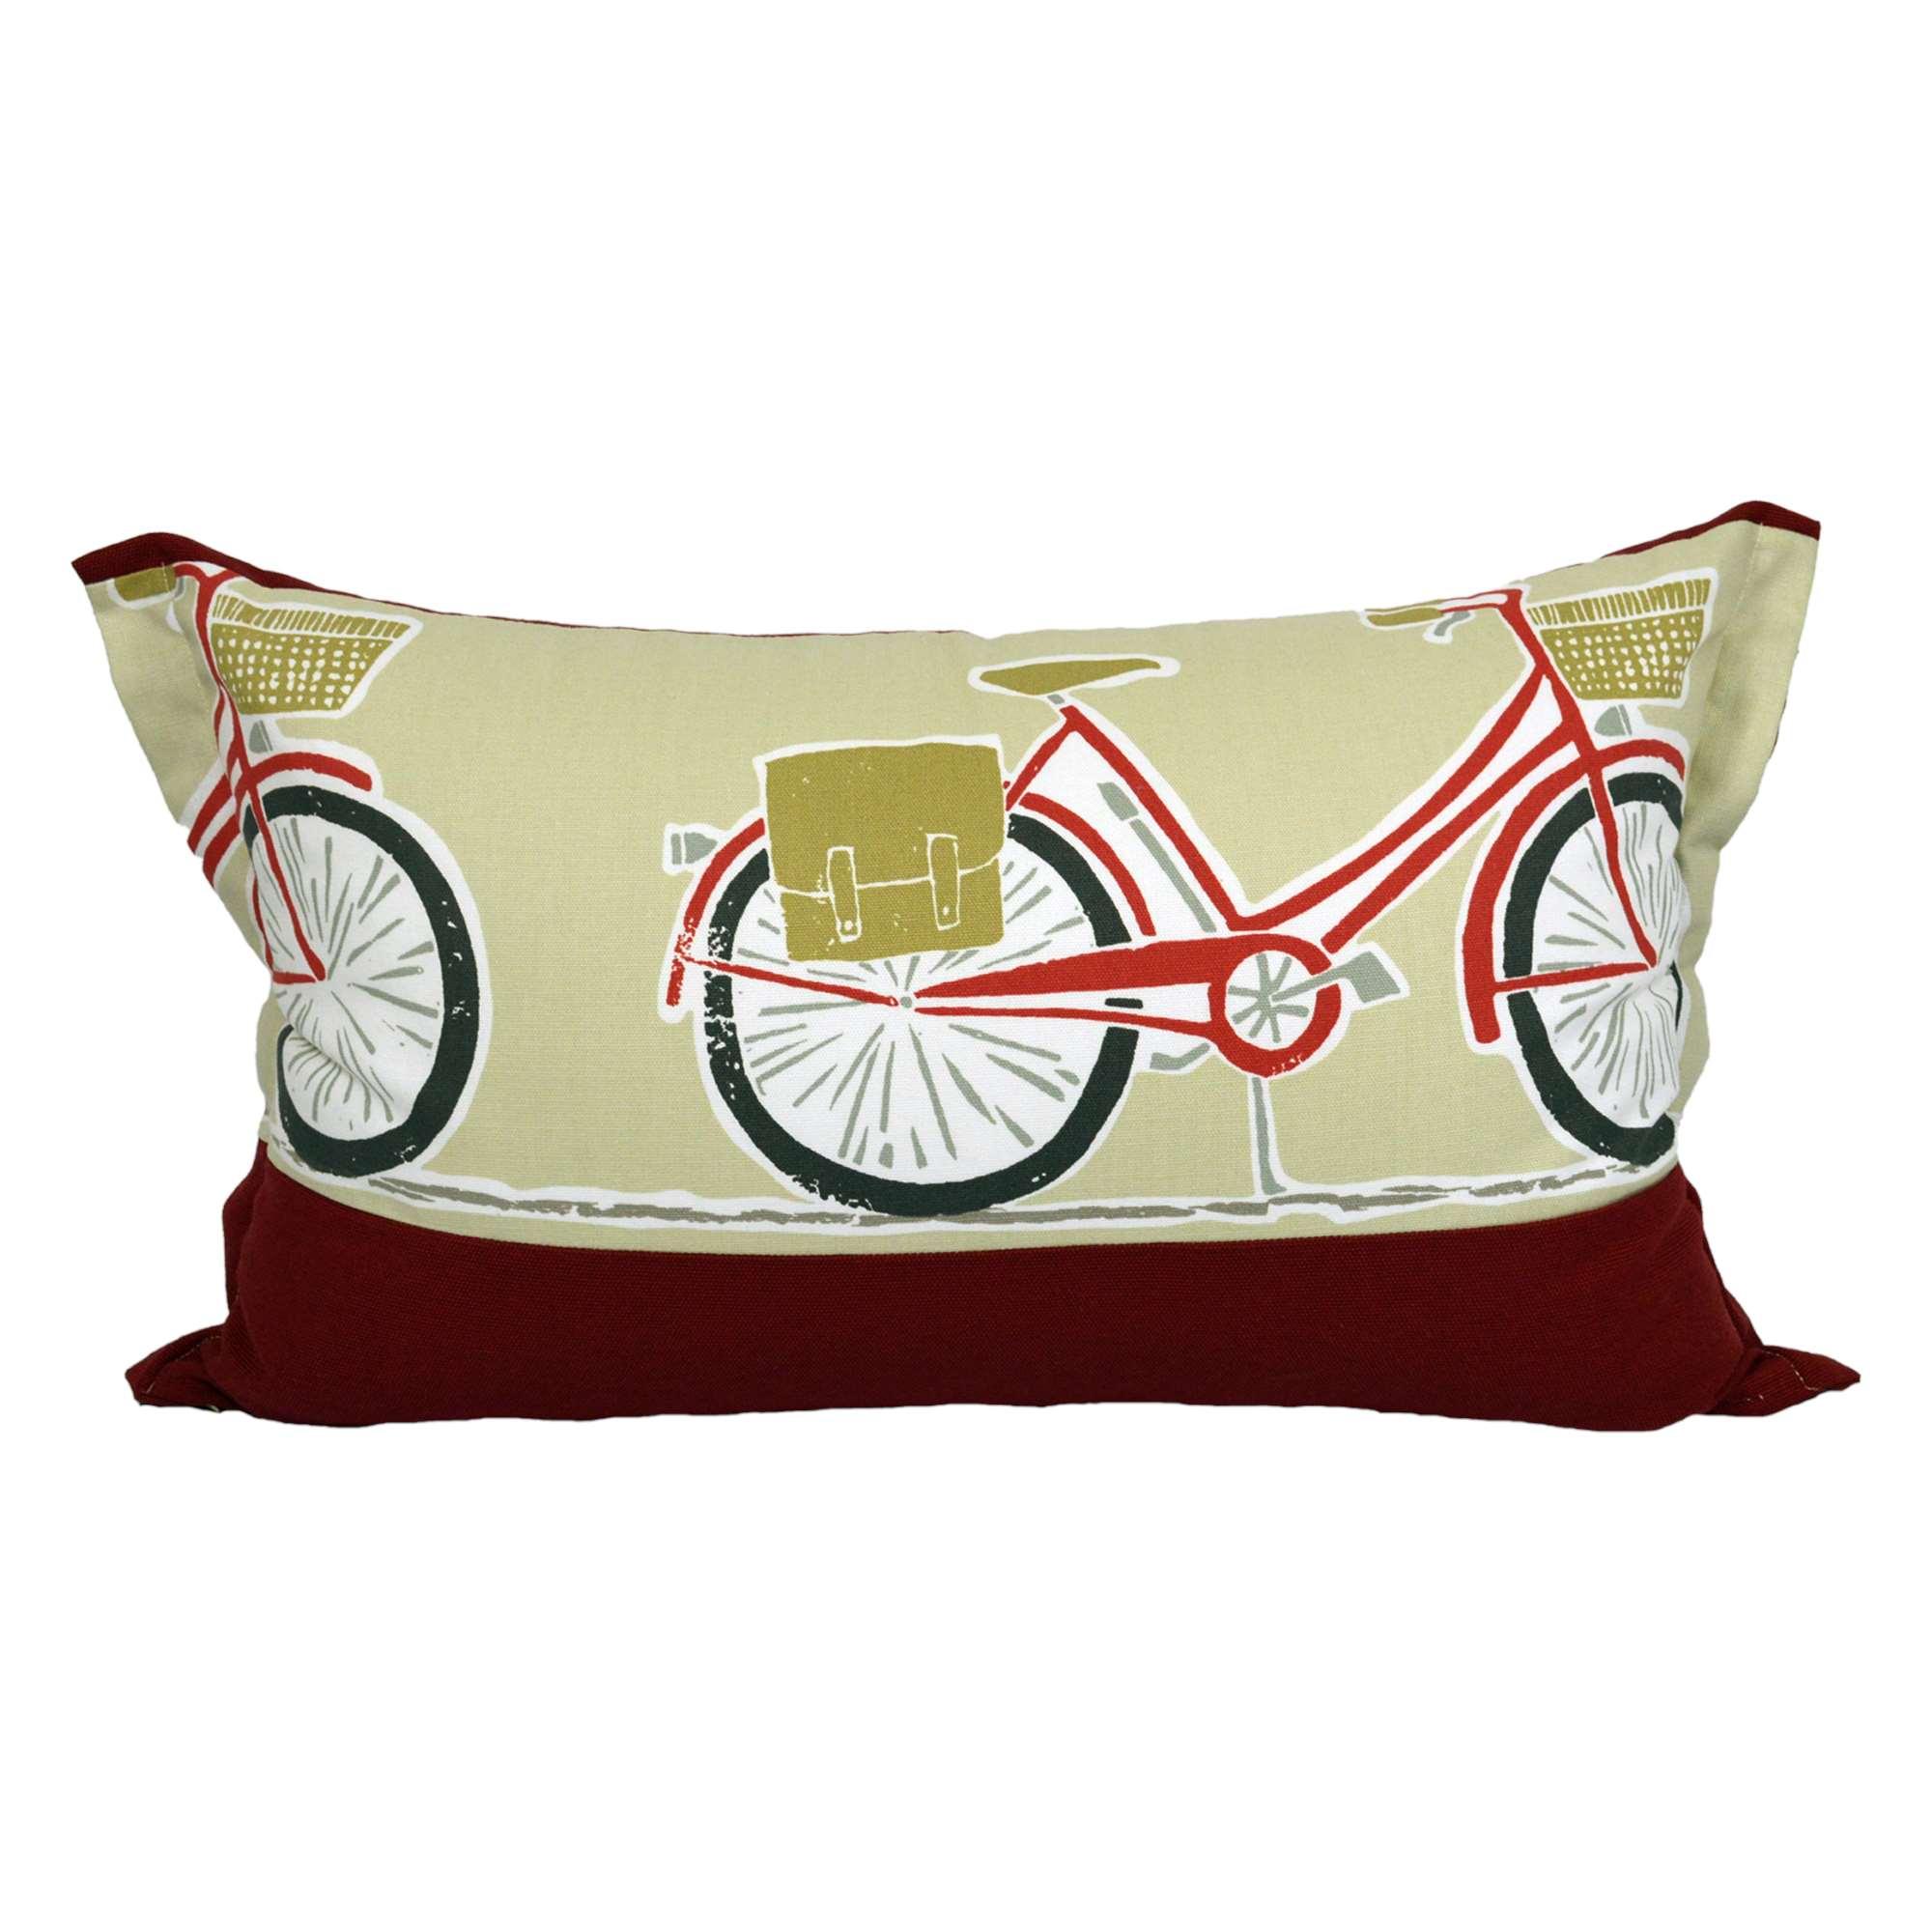 Federa cuscino stampa bici tina codazzo home for Misure cuscino carrozzina